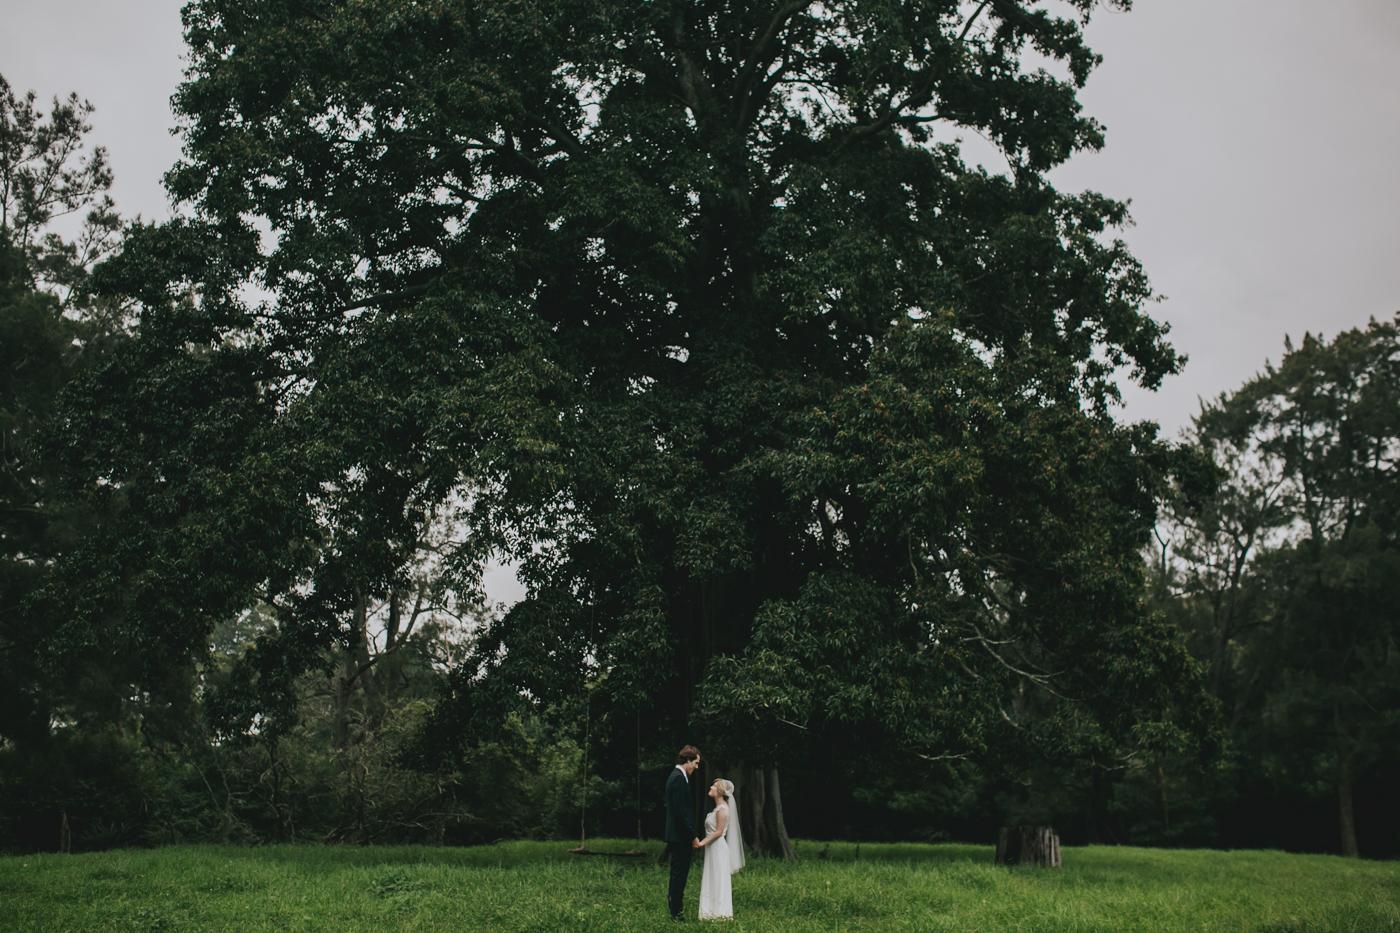 Rachel & Jacob - Willow Farm Berry - South Coast Wedding - Samantha Heather Photography-160.jpg